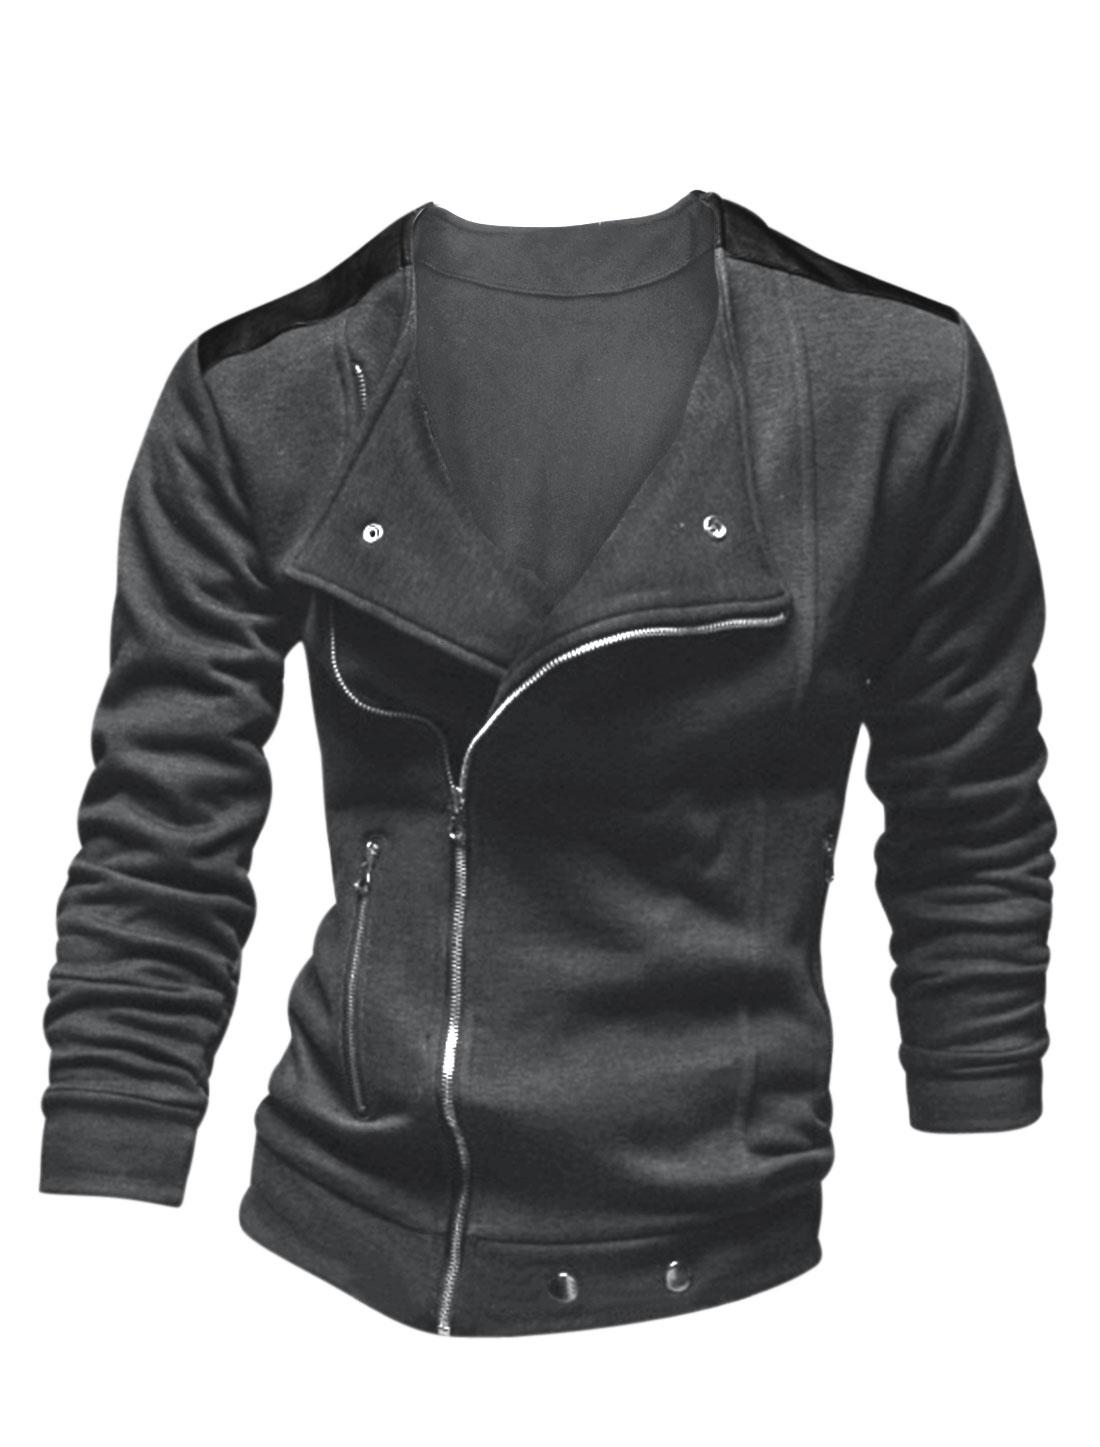 Men Imtation Leather Panel Zip Closure Trendy Jacket Dark Gray M